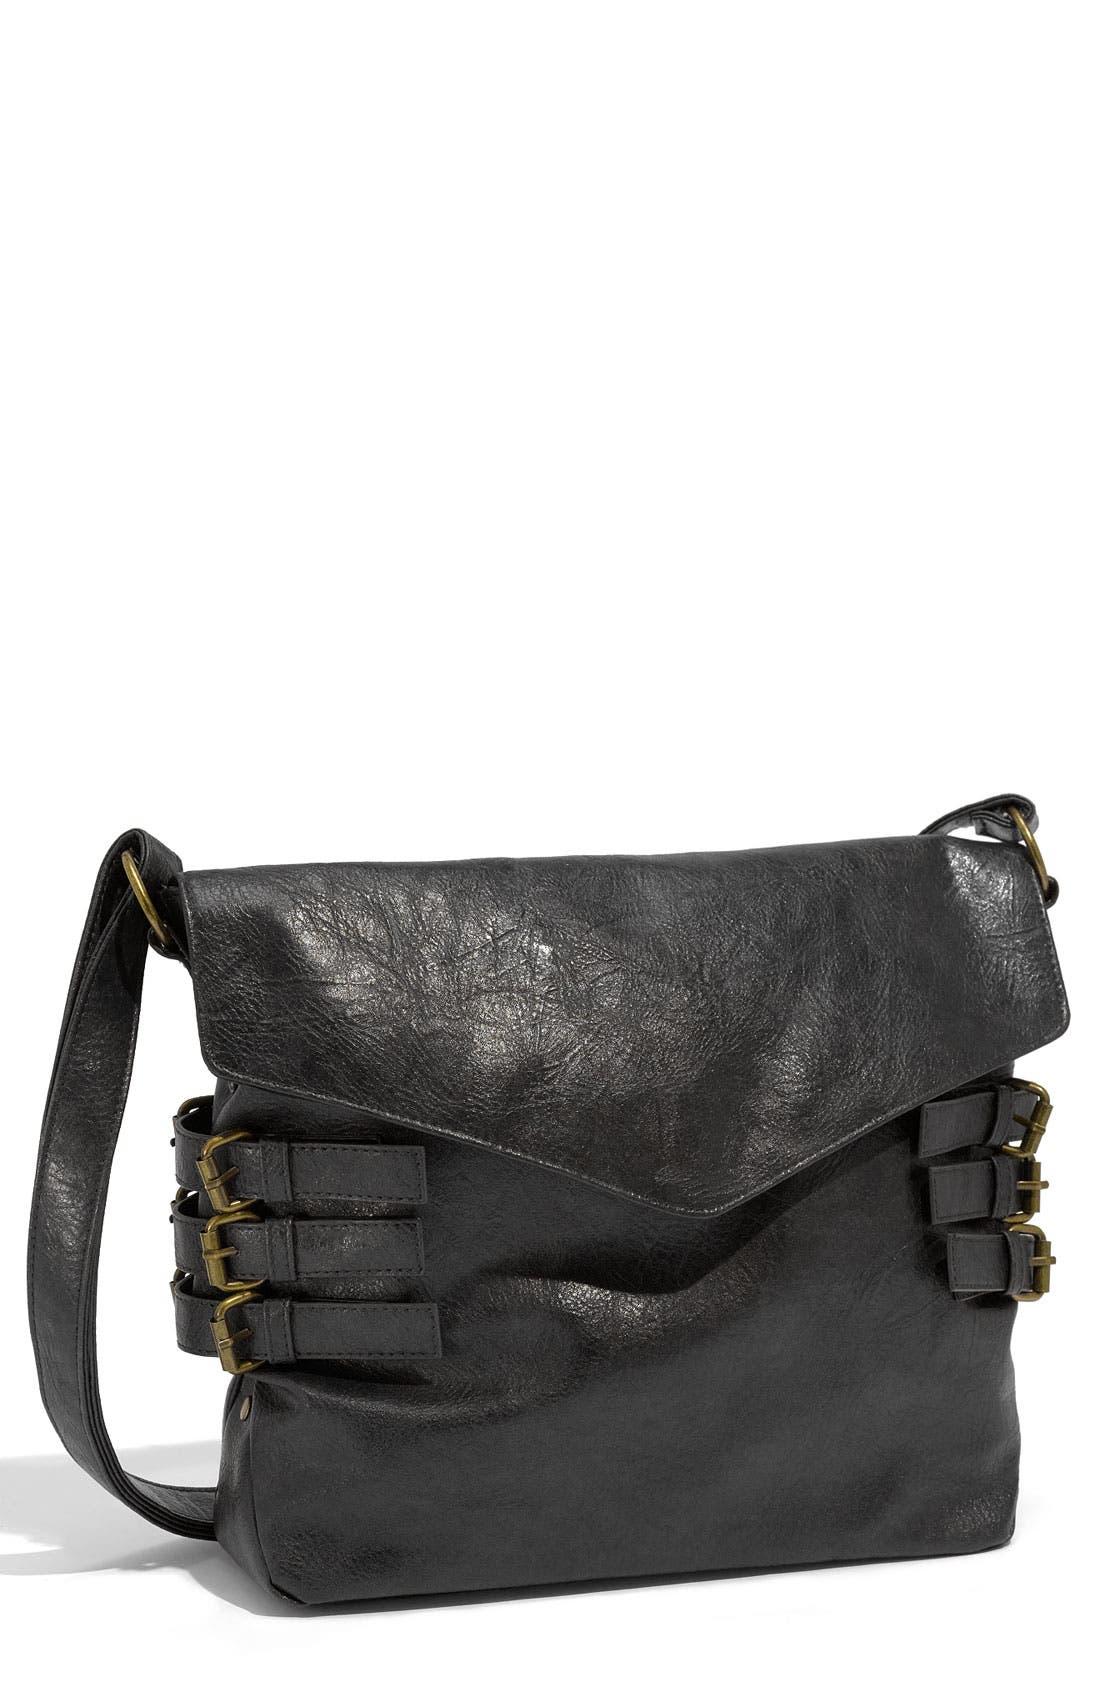 Alternate Image 1 Selected - Lulu Buckled Envelope Bag